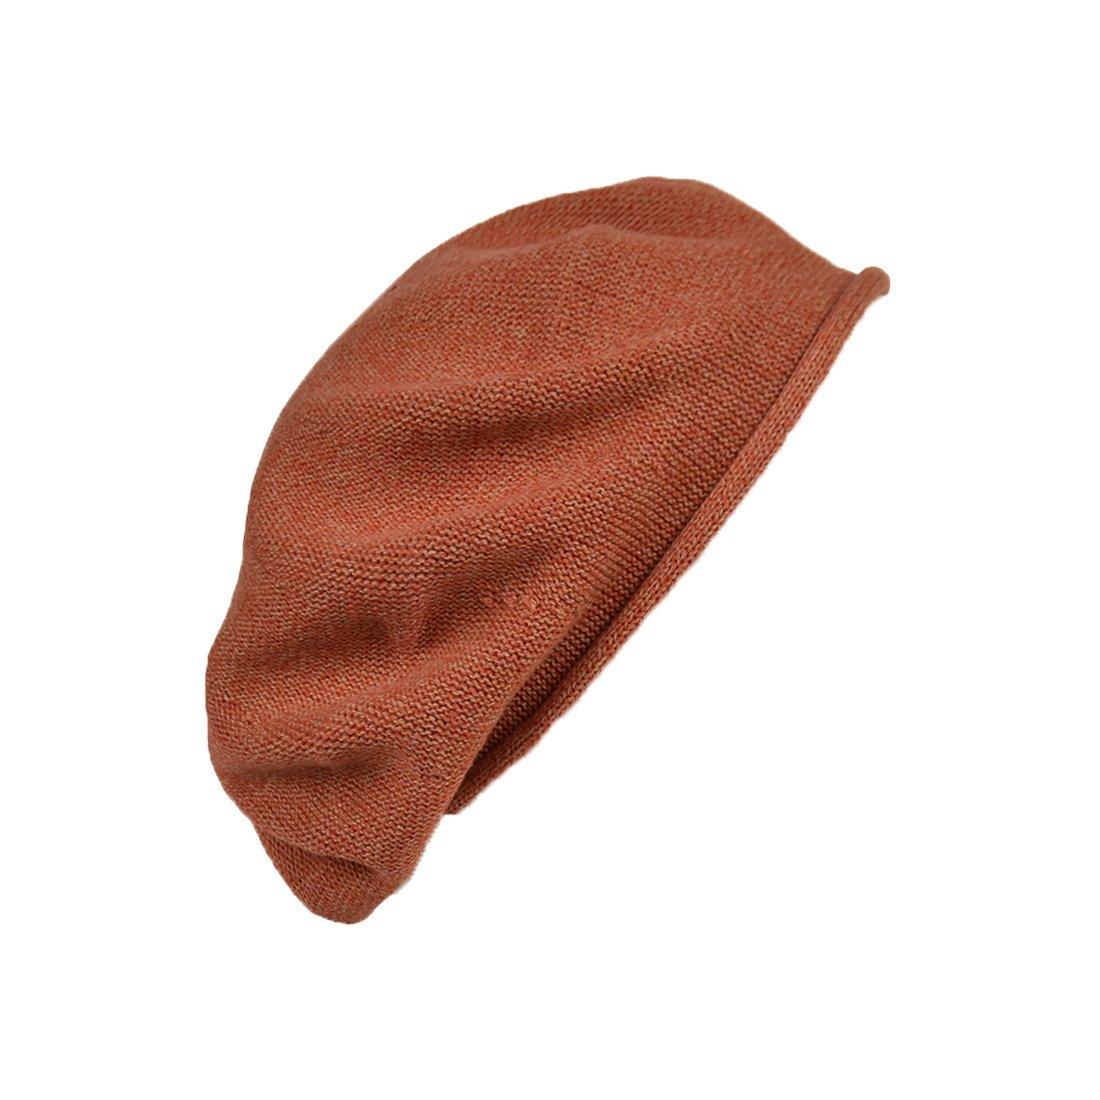 Landana Headscarves Melange Beret for Women 100% Cotton Solid - Orange